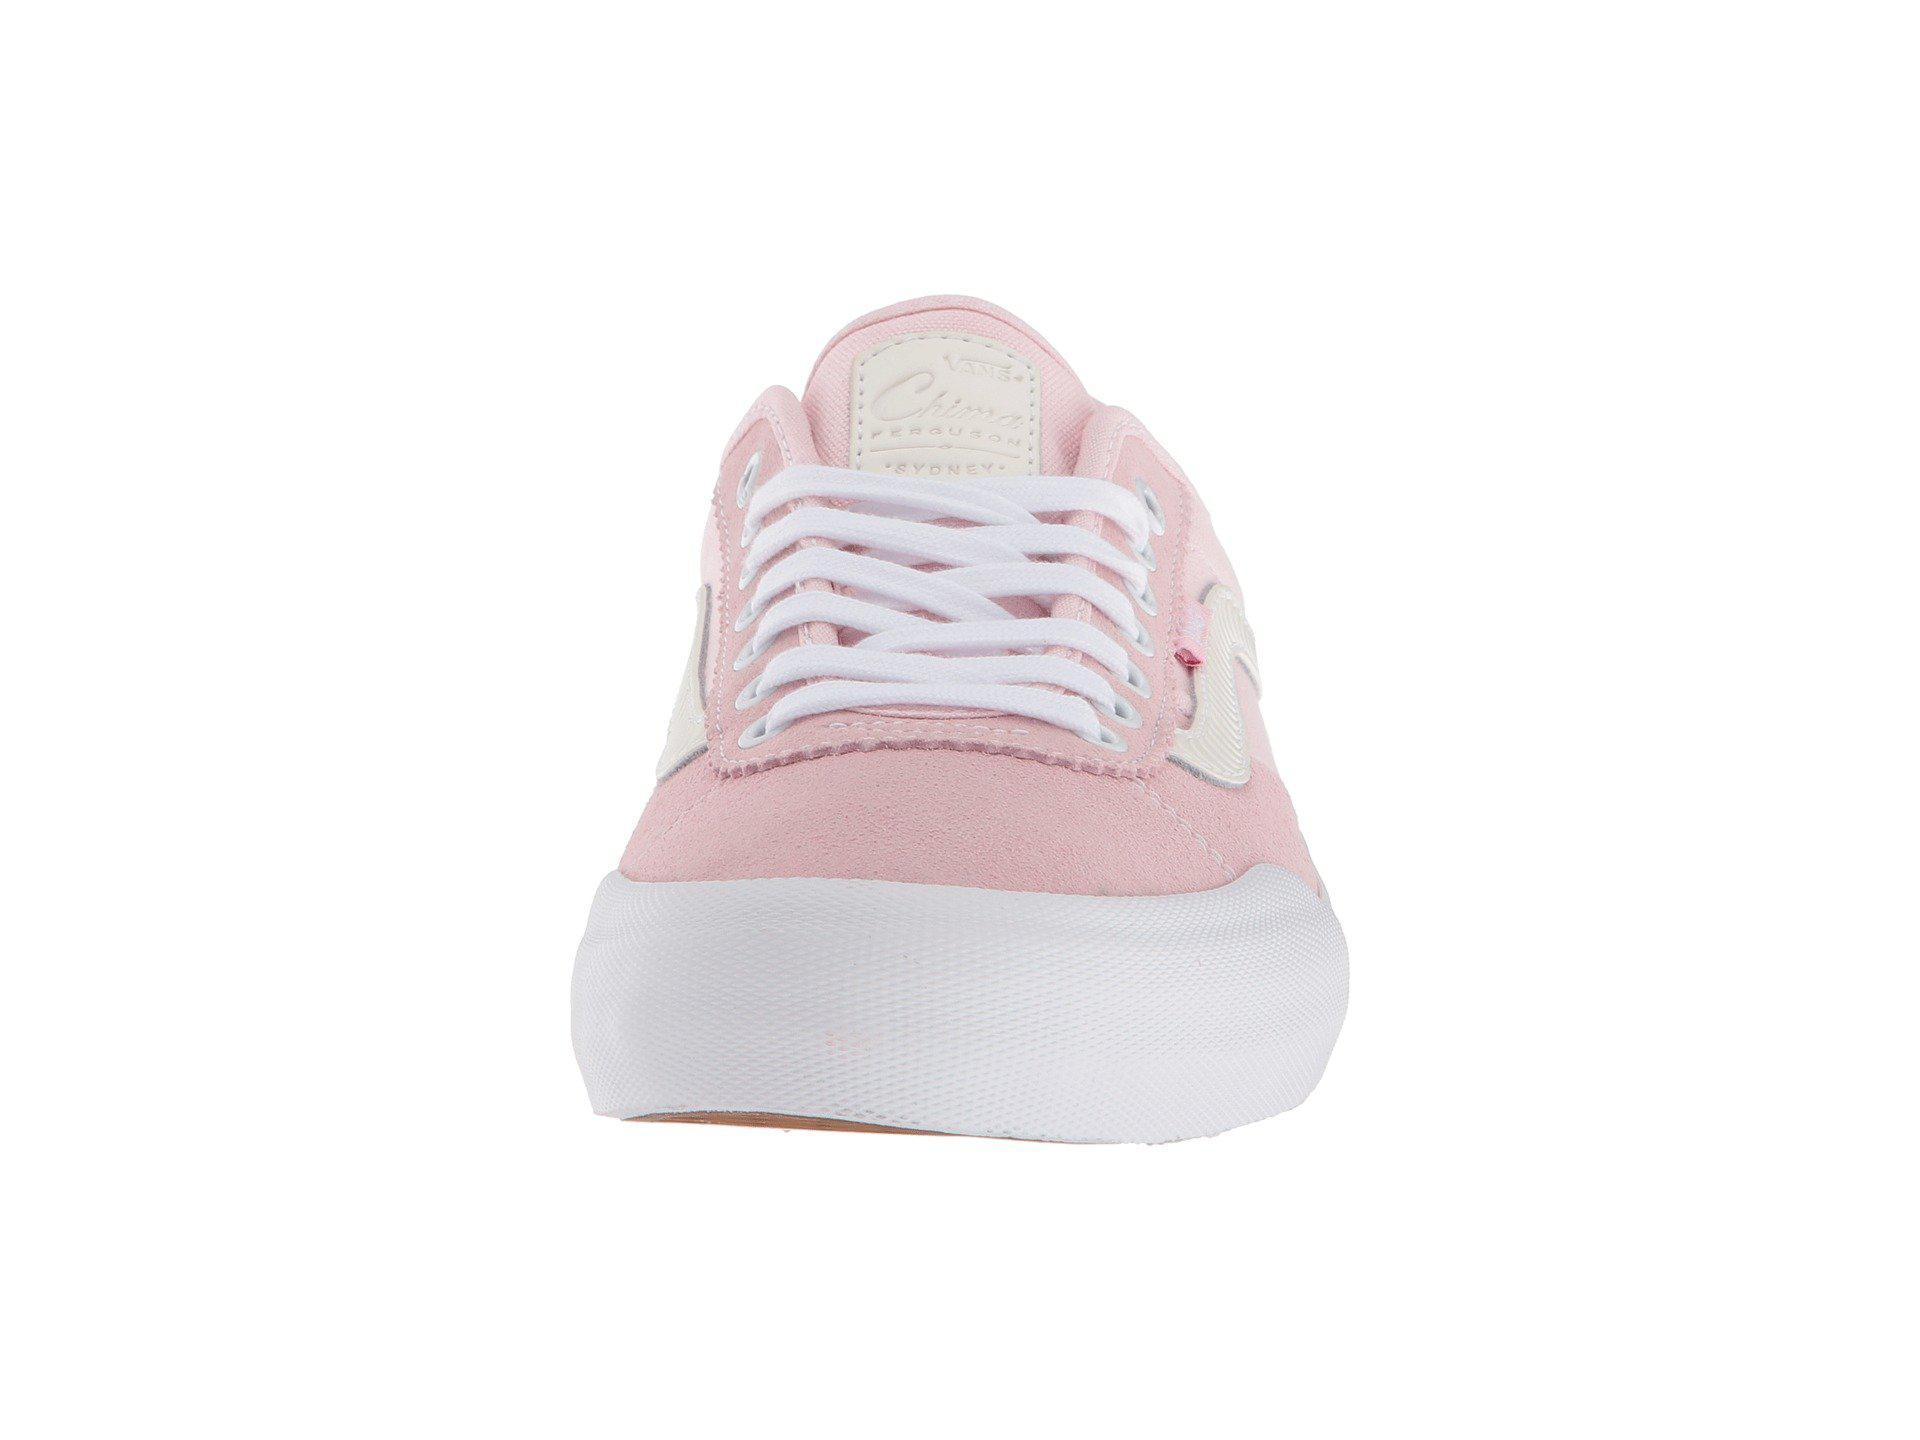 0ad7b41a3fcc Lyst - Vans Chima Pro 2 (dark Denim dachshund) Men s Skate Shoes in Pink